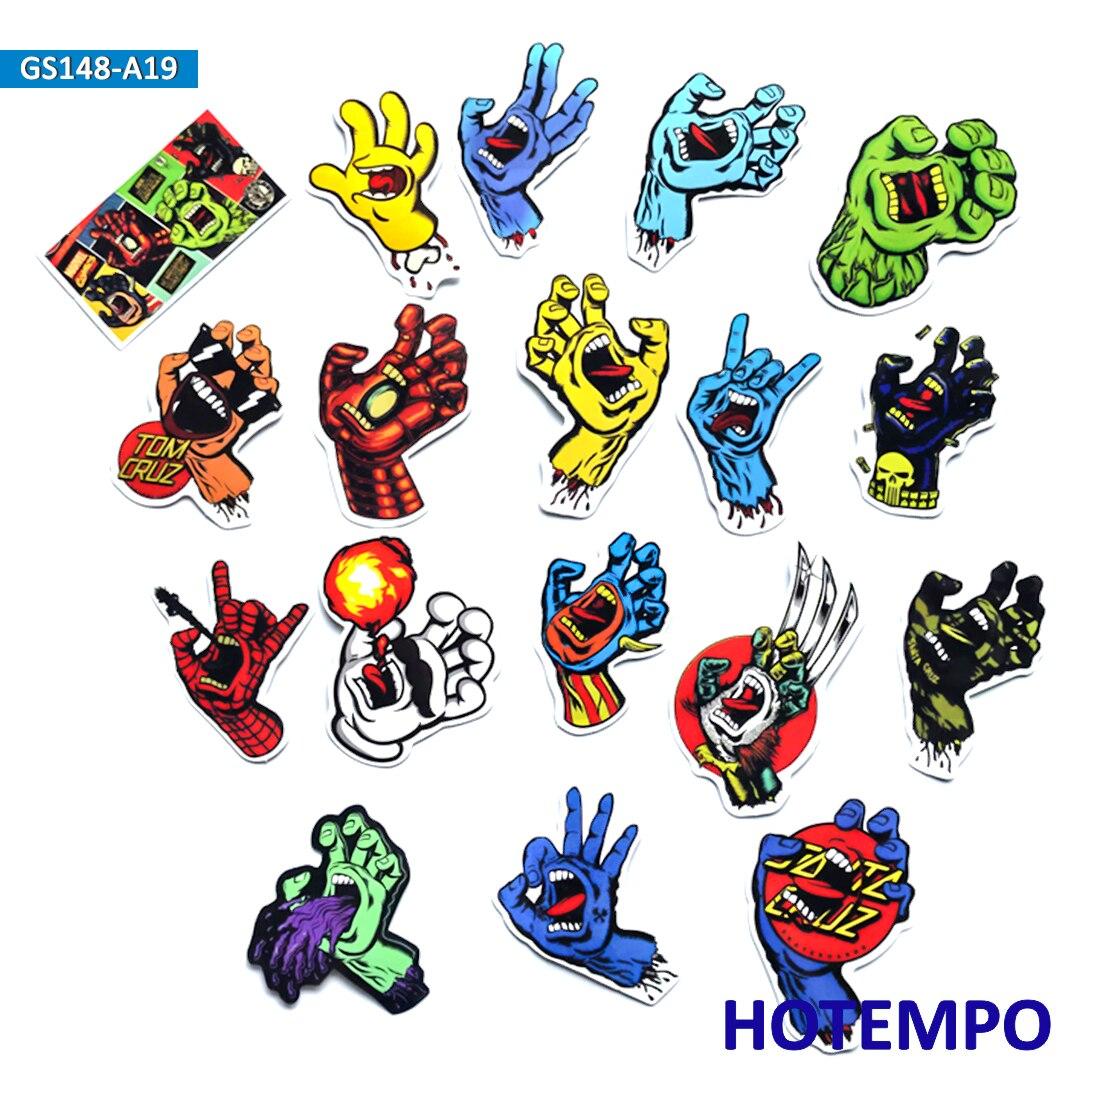 18pcs Santa Cruz Super Hero Screaming Hand Style Stickers For Mobile Phone Laptop Luggage Skateboard Fixed Gear Bike Stickers